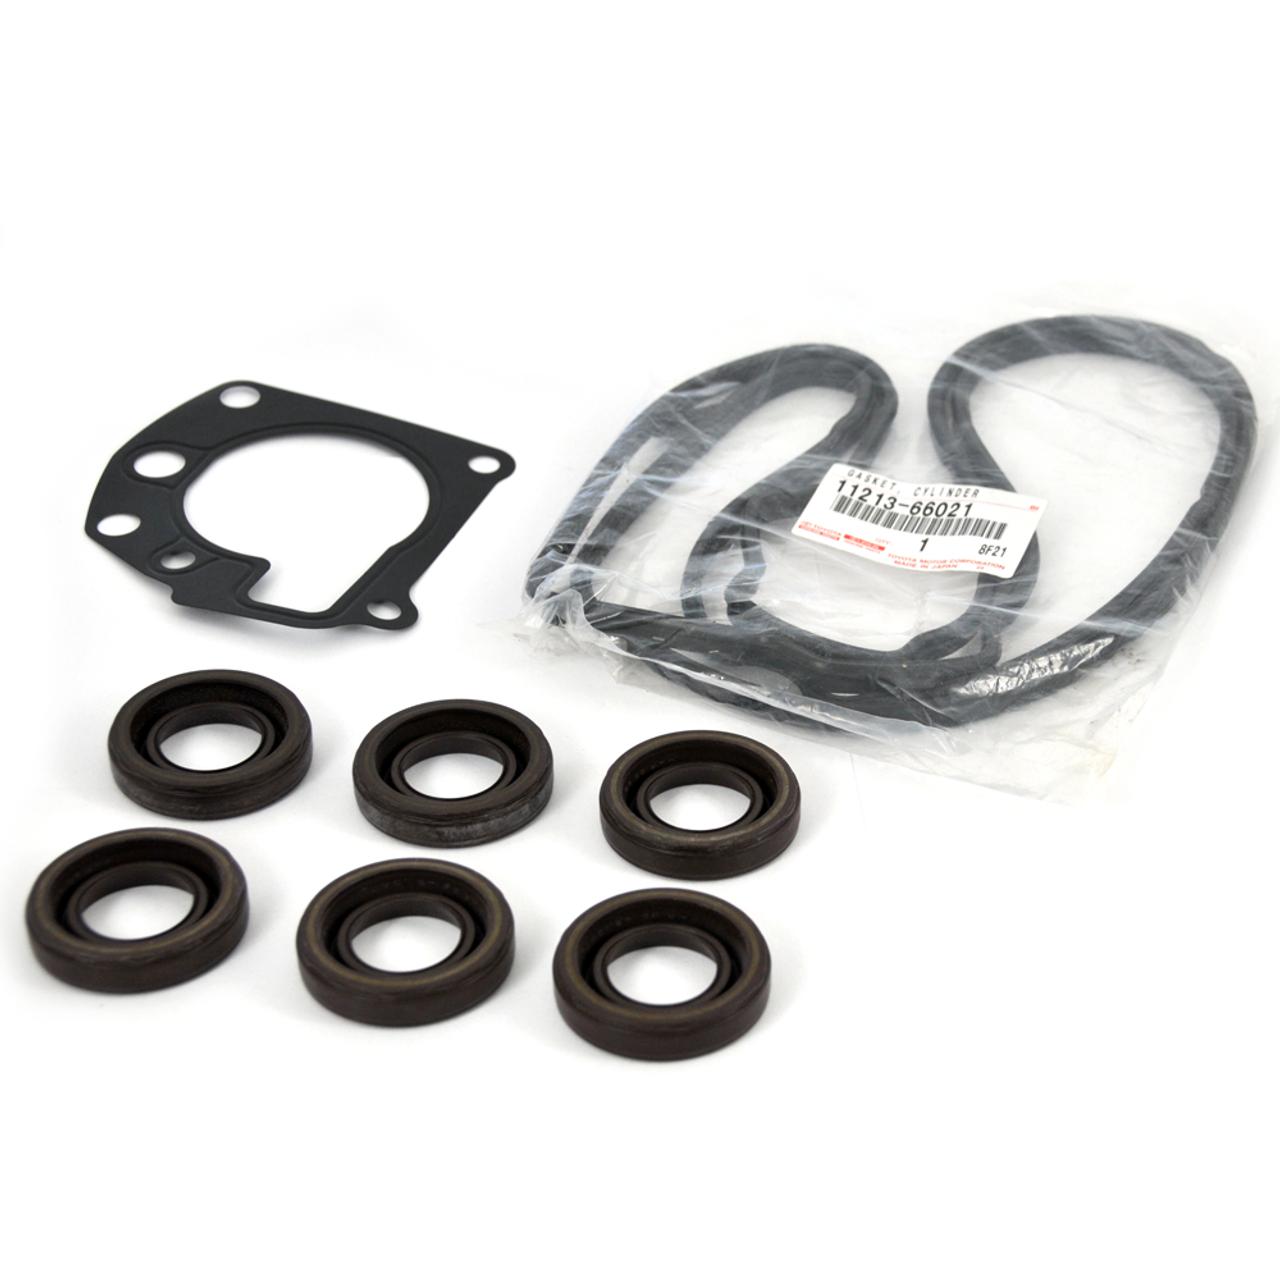 80 Series 1FZ Valve Cover Leak Kit (VCK-1)